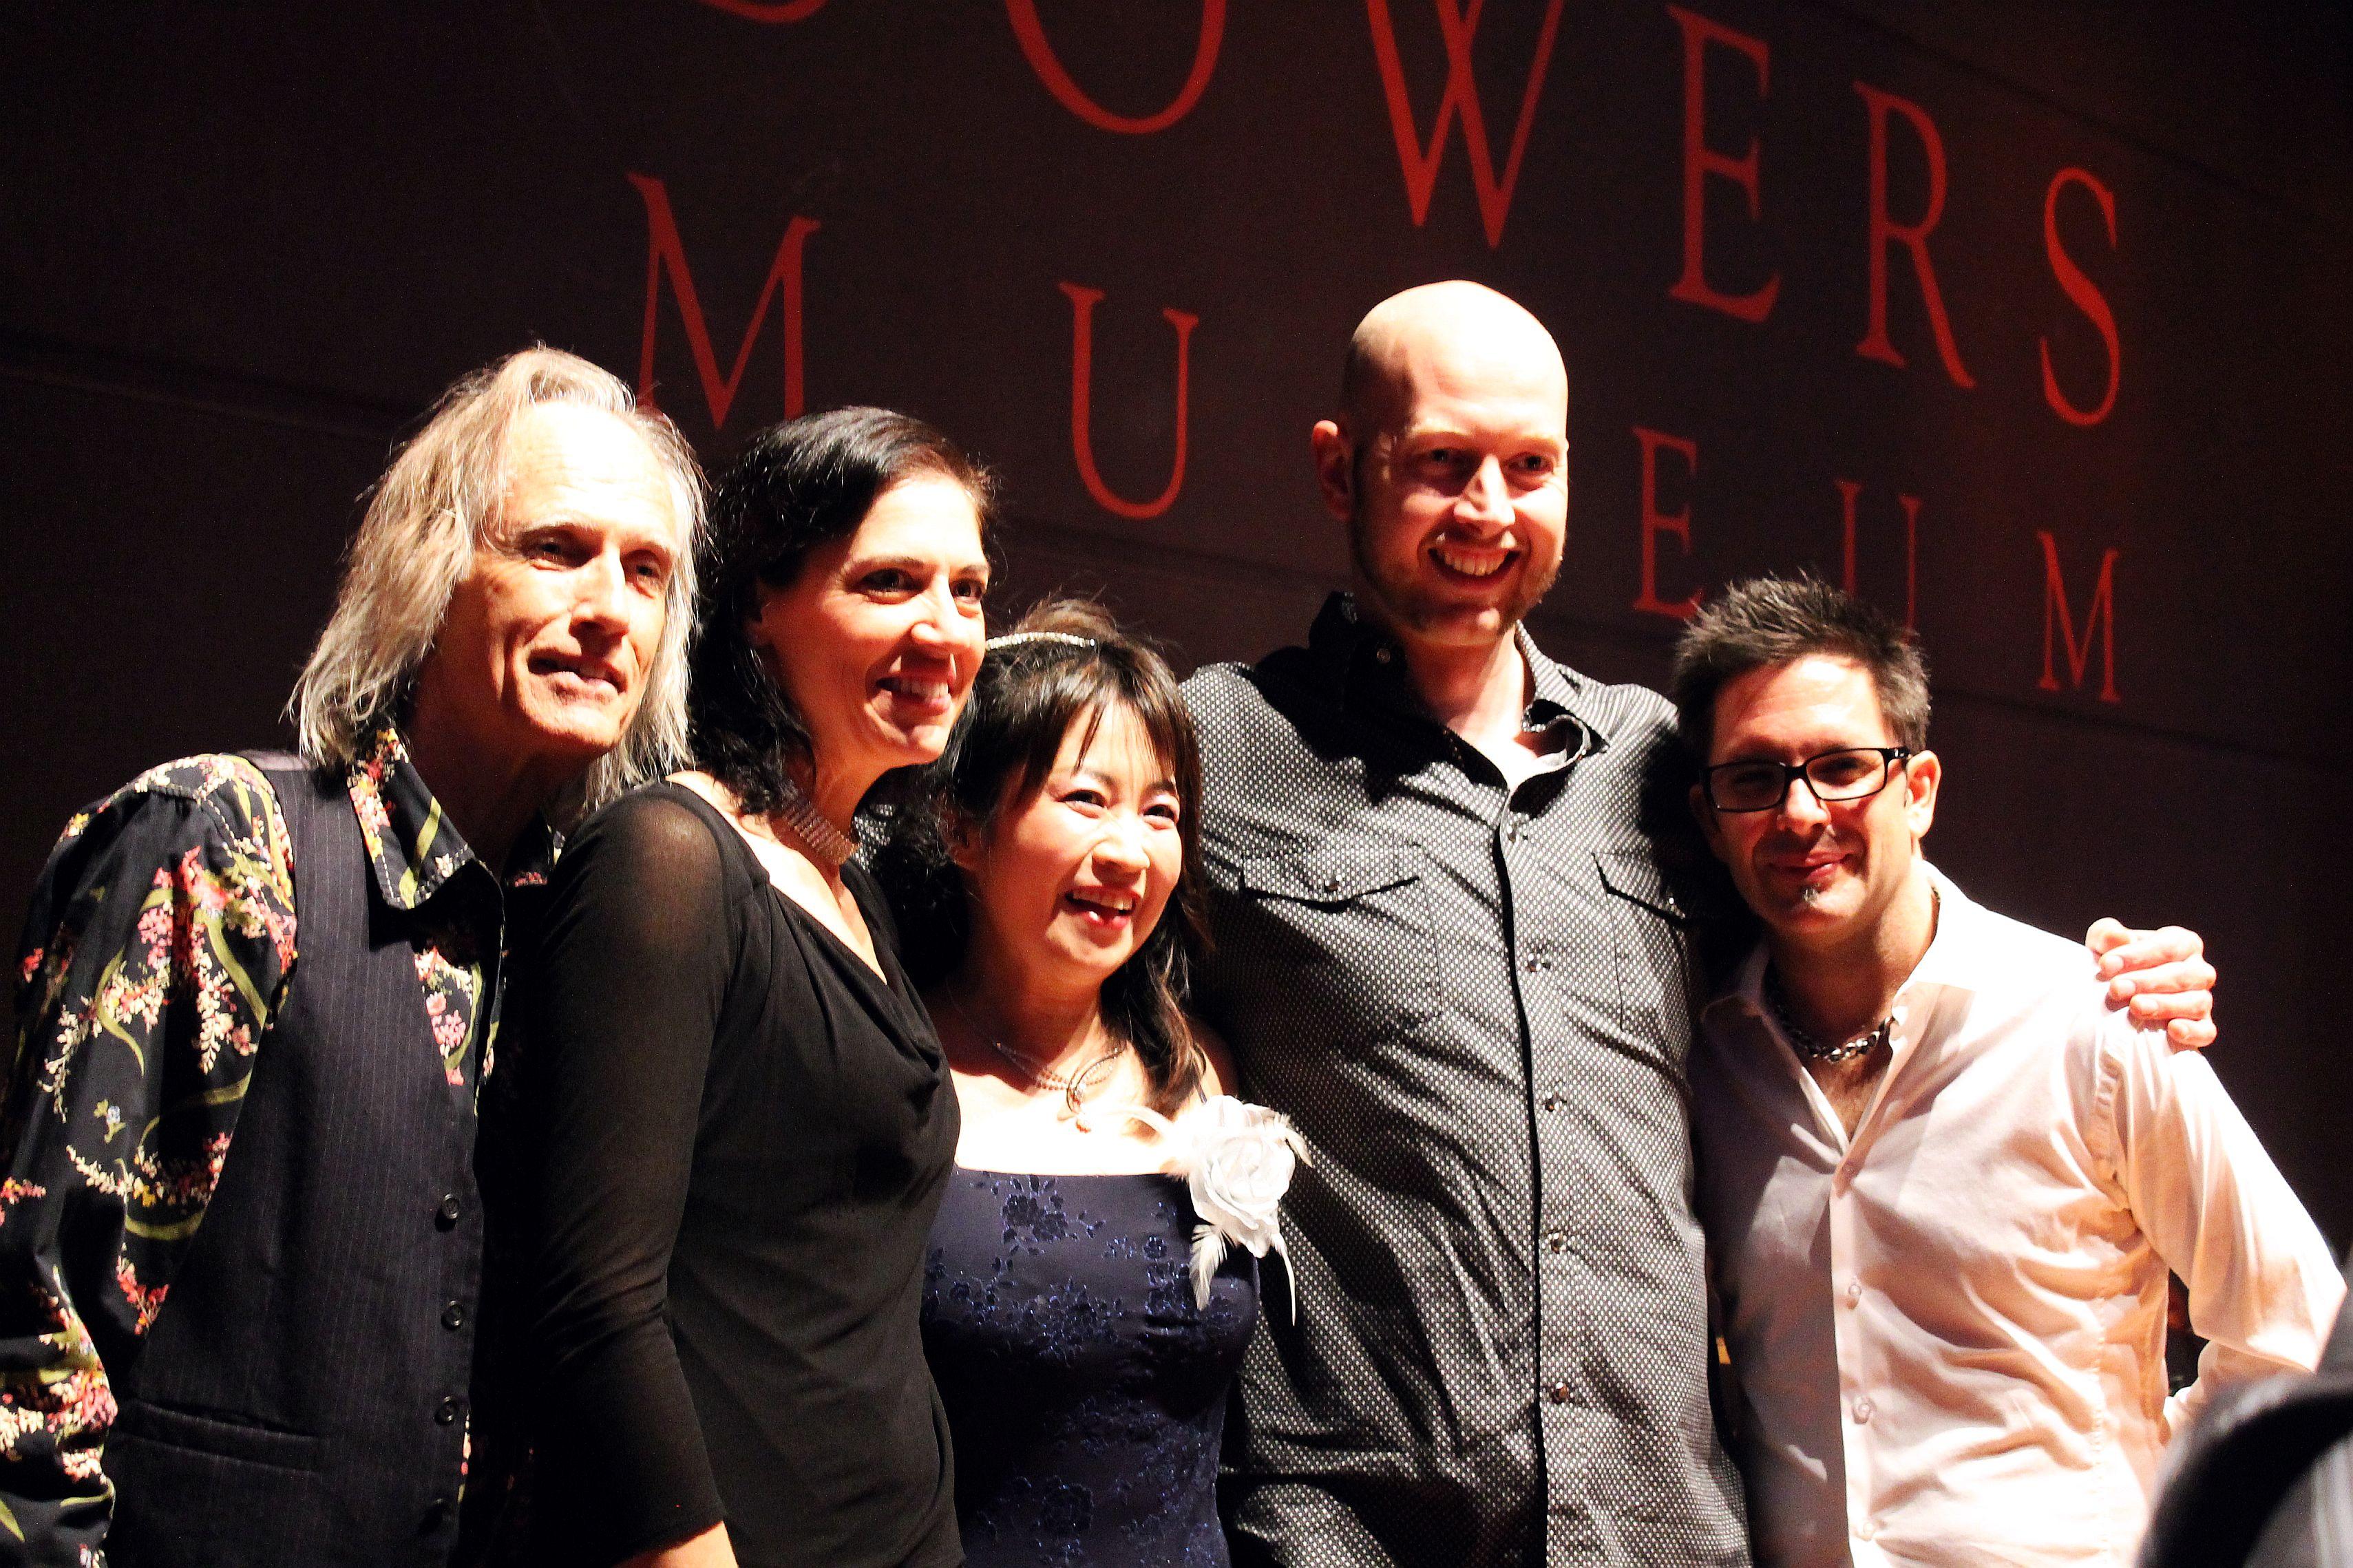 Yukiko Matsuyama & Friends with Special Guest John York